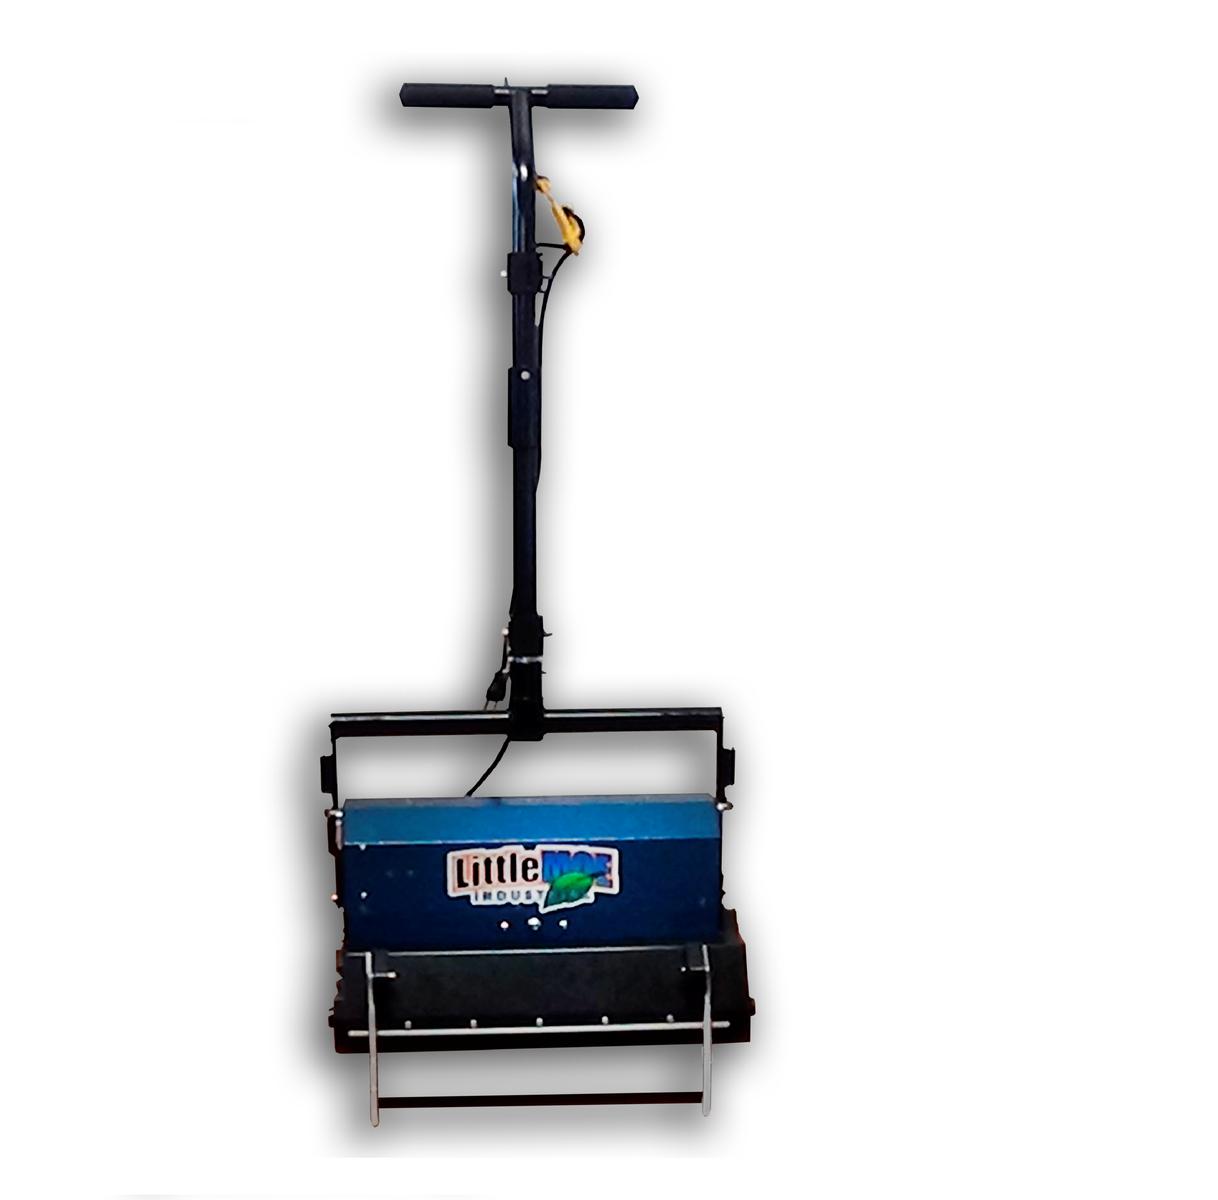 LittleMoe industrial equipment